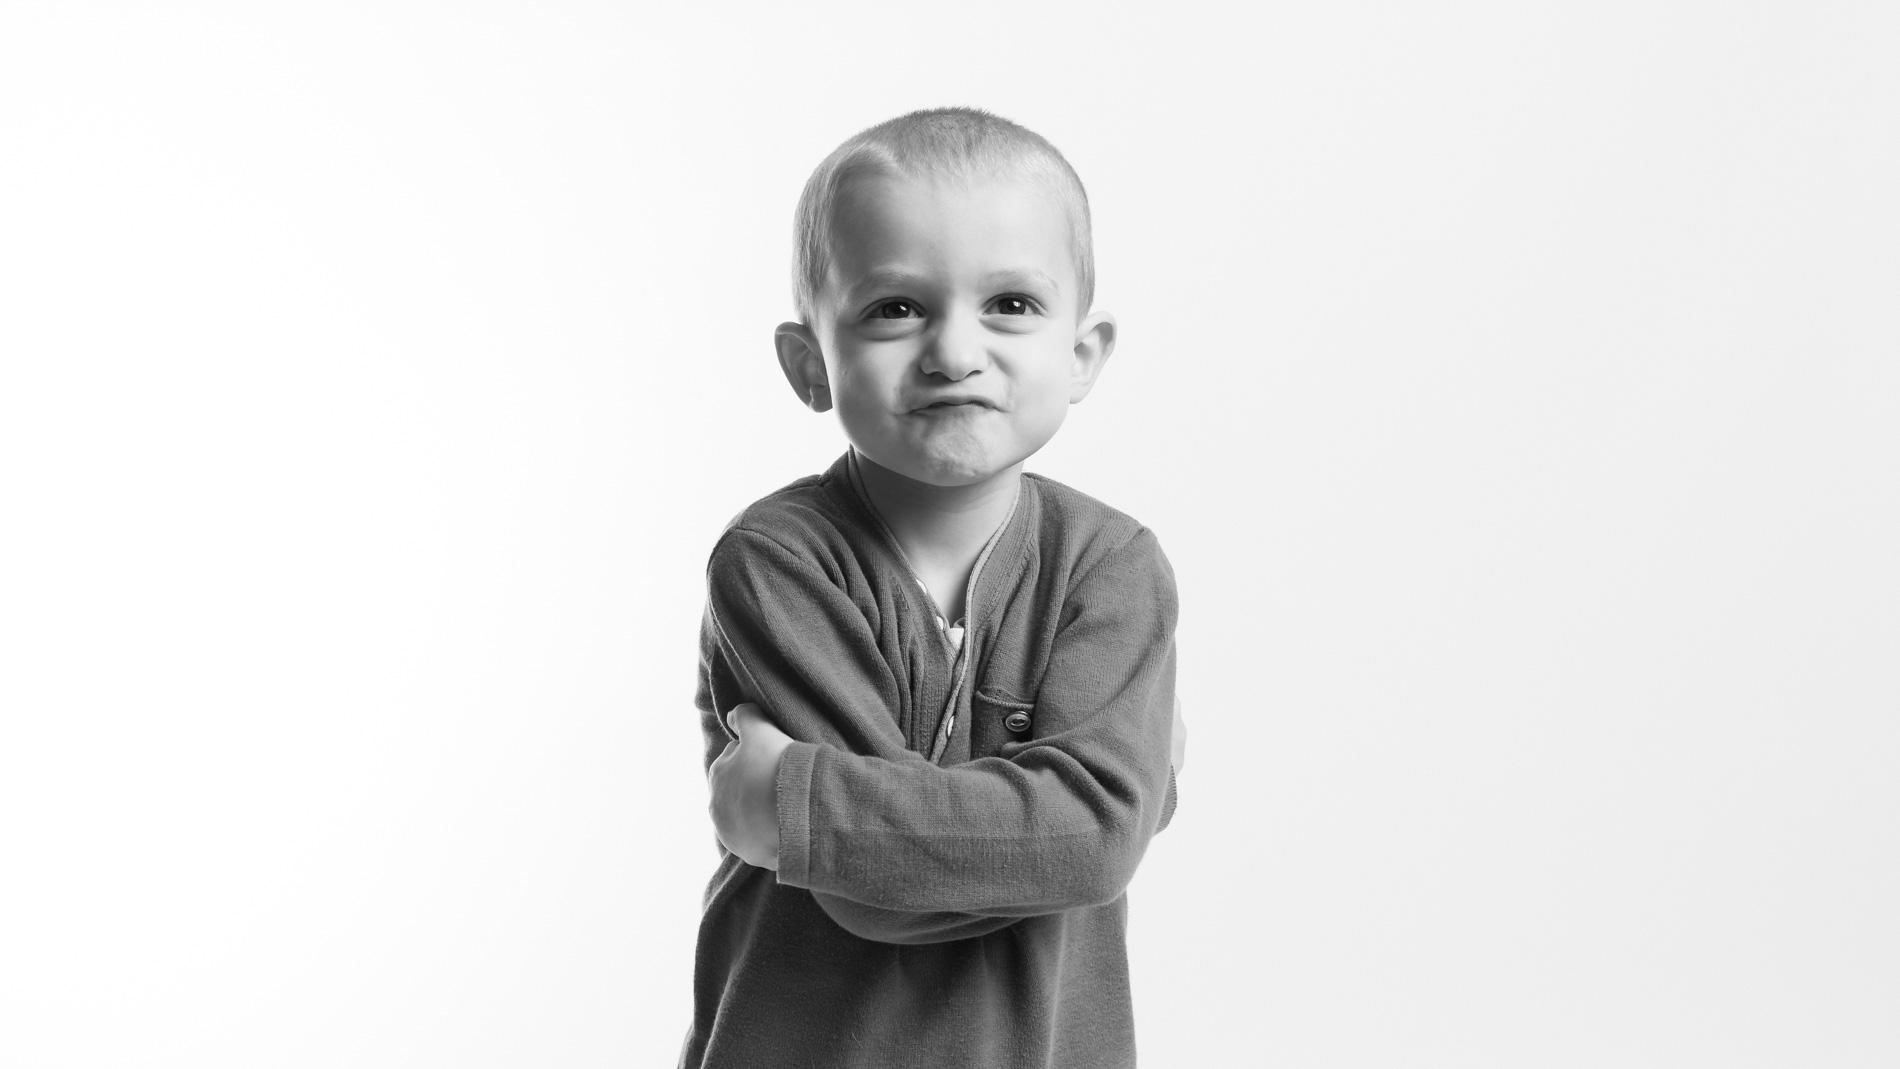 seance-photo-enfant-noir-et-blanc.jpg